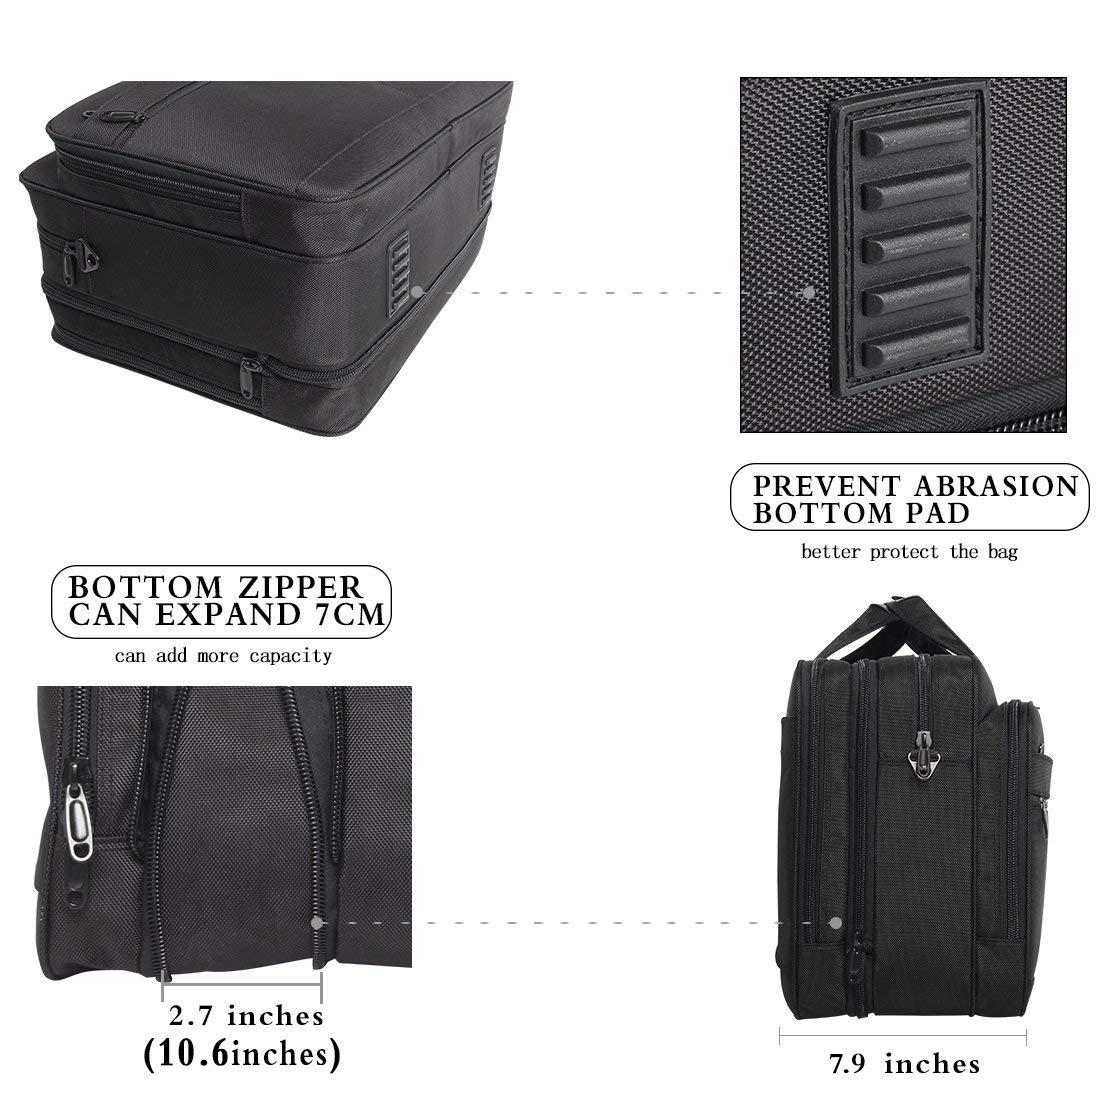 18-18.5 inch Laptop Bag,Water Resisatant Business Laptop Briefcase,Expandable High Capacity Shoulder Bag,Nylon Multi-Functional Shoulder Messenger Bag for Men Fits 17.3 inch Loptop,Computer,Tablet by LYALPH (Image #5)